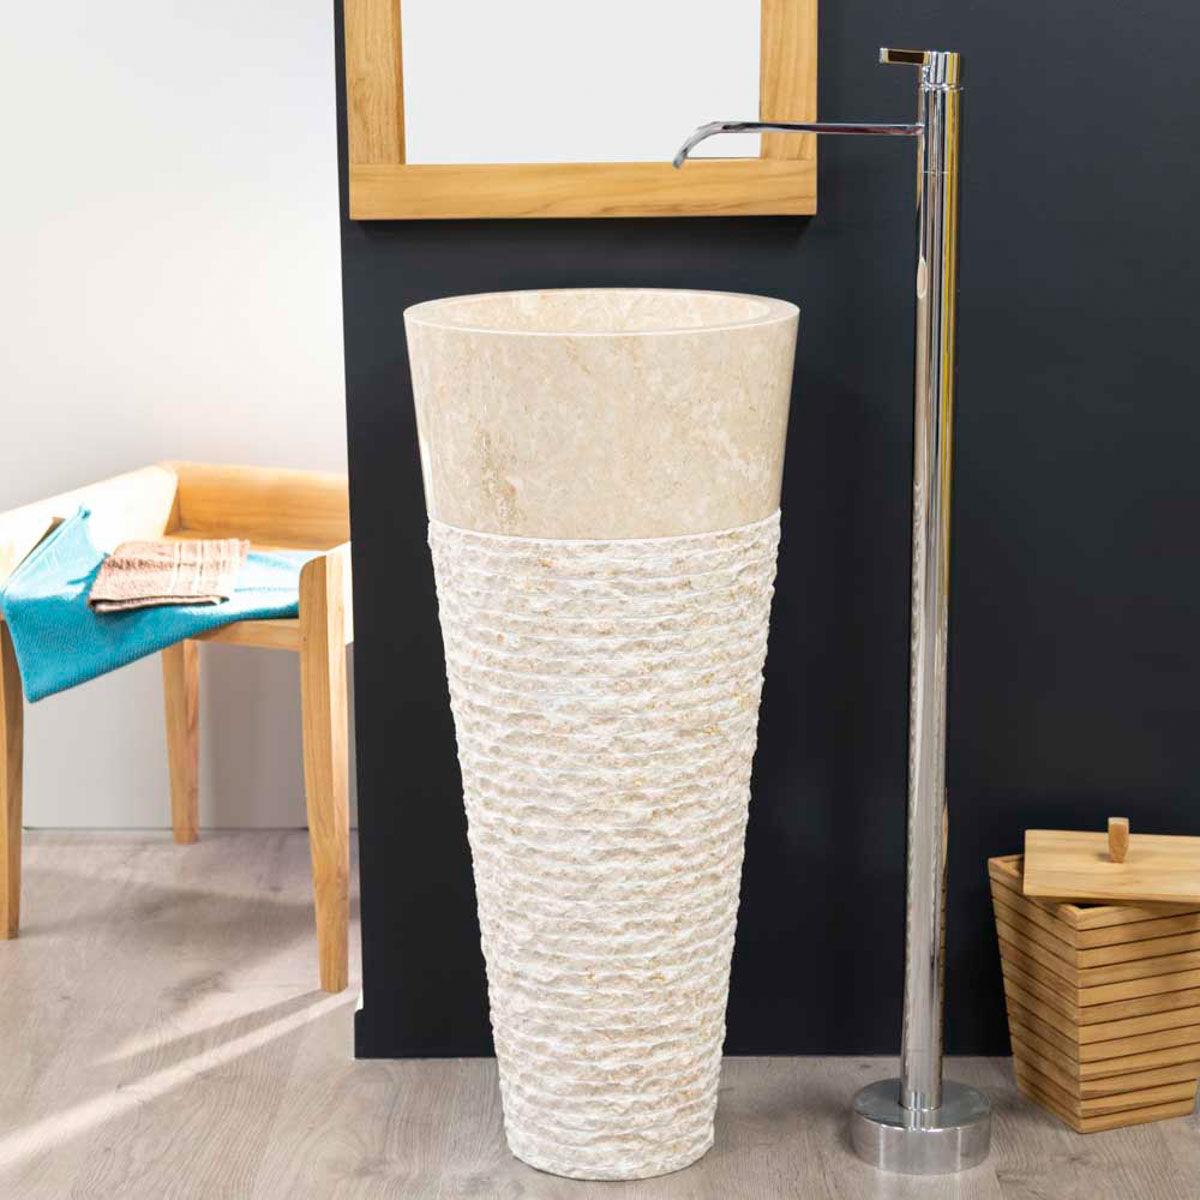 Wanda Collection Vasque sur pied conique en marbre FLORENCE crème